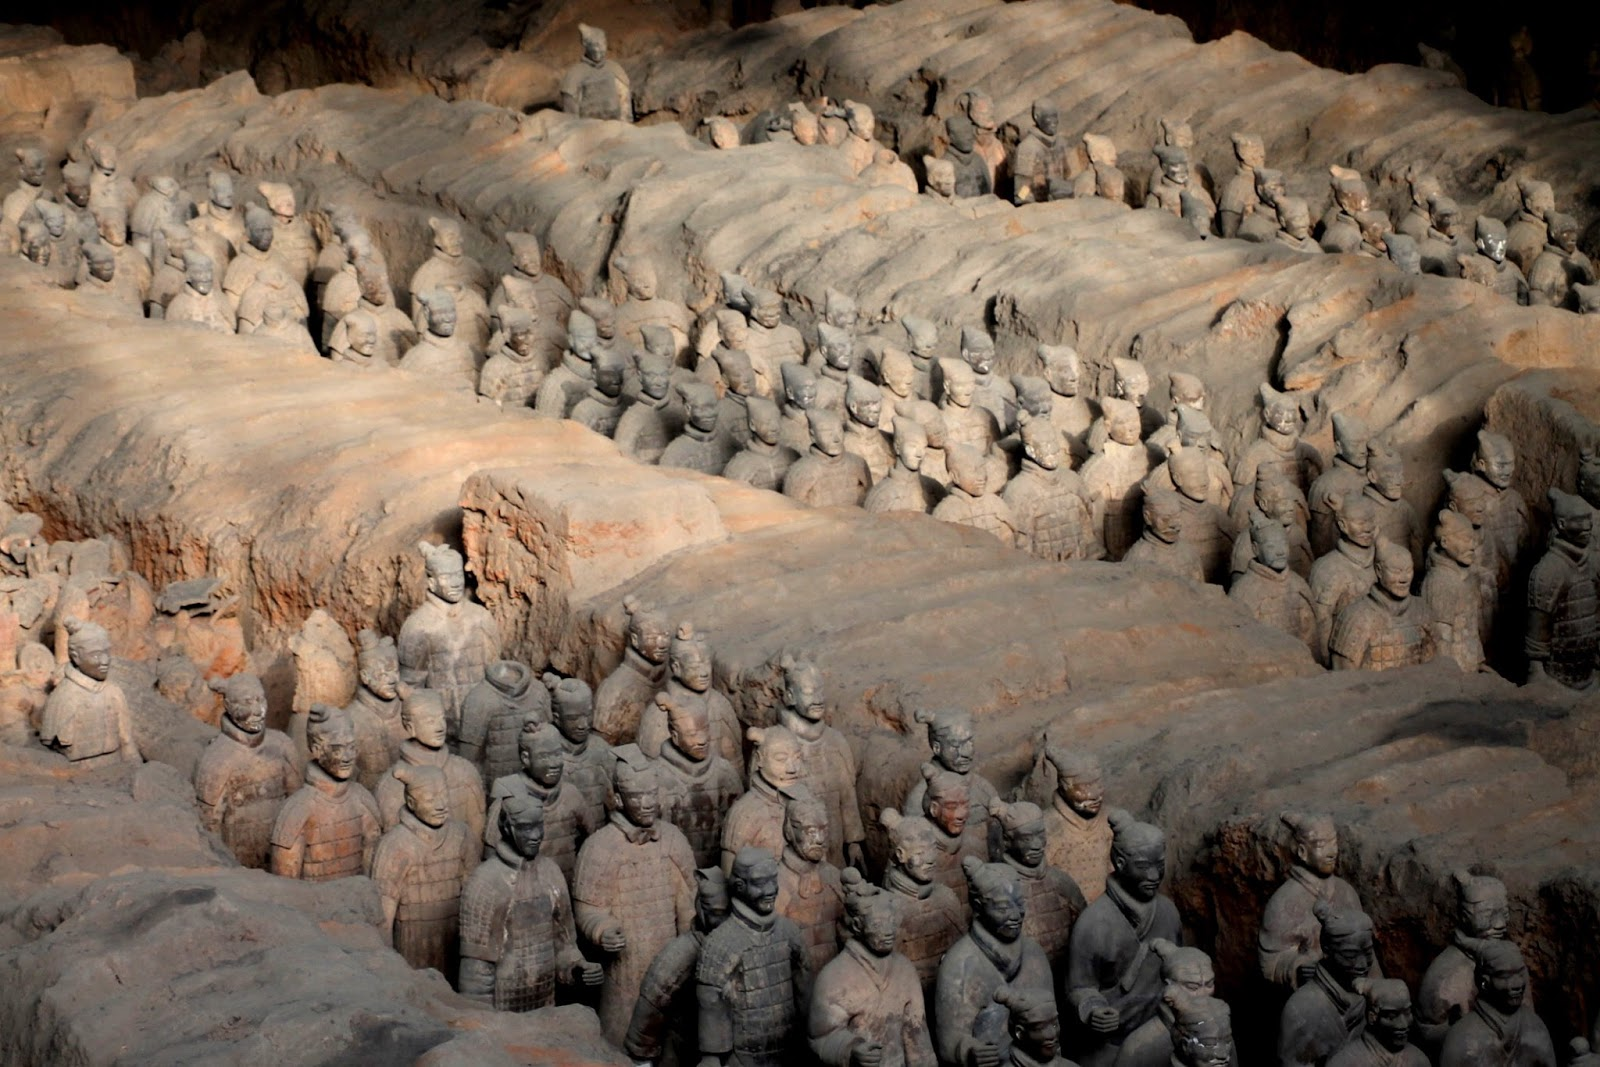 esercito di terracotta xian cina